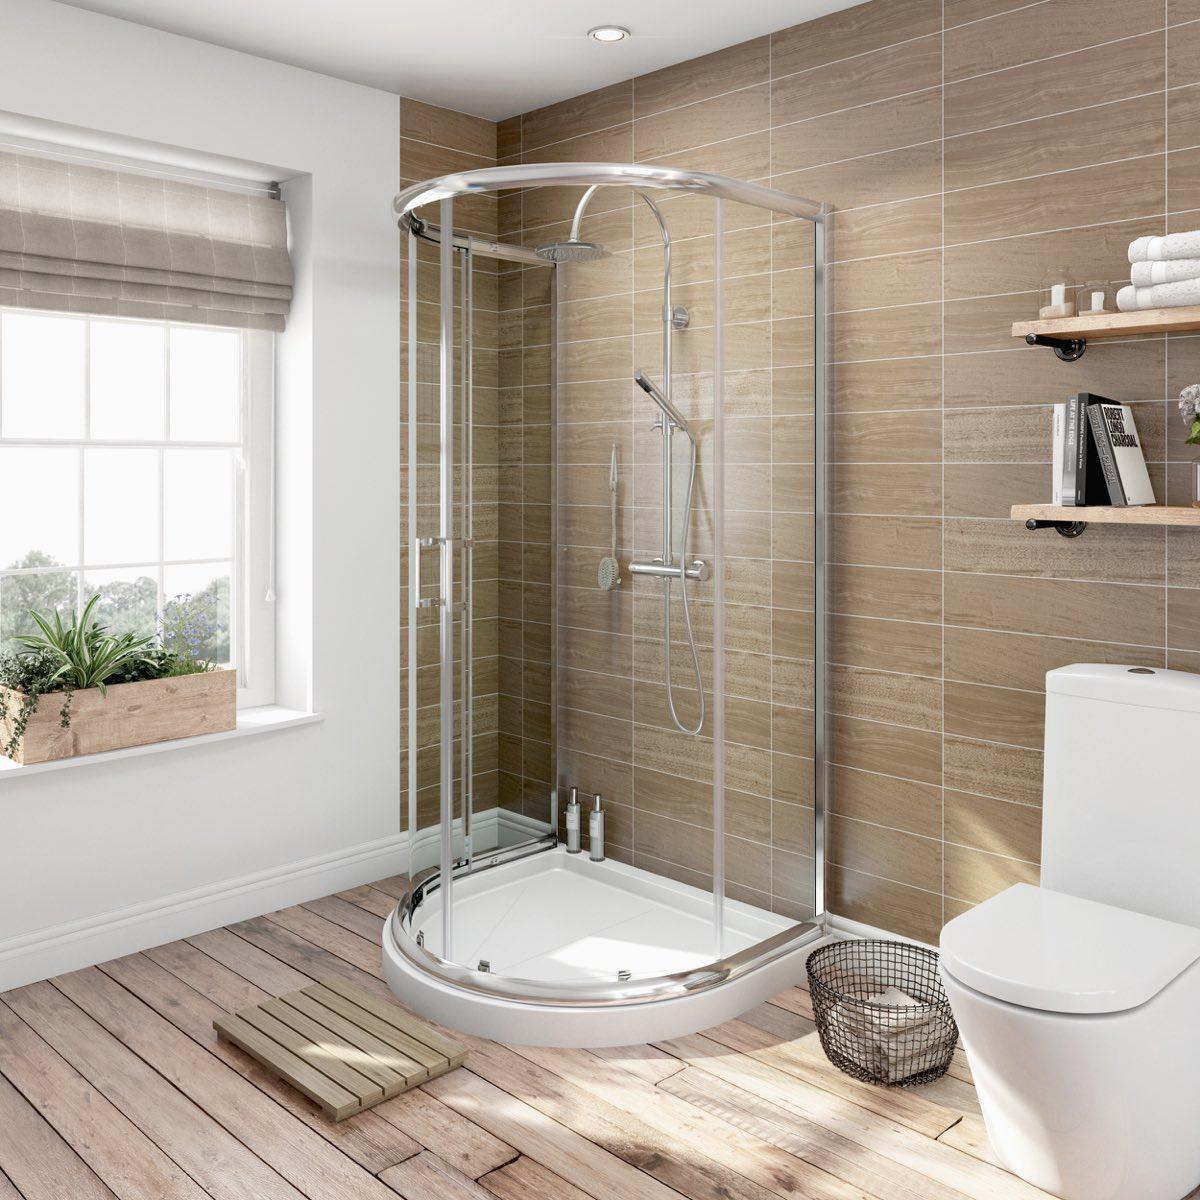 Curved Shower Door For Bathtub